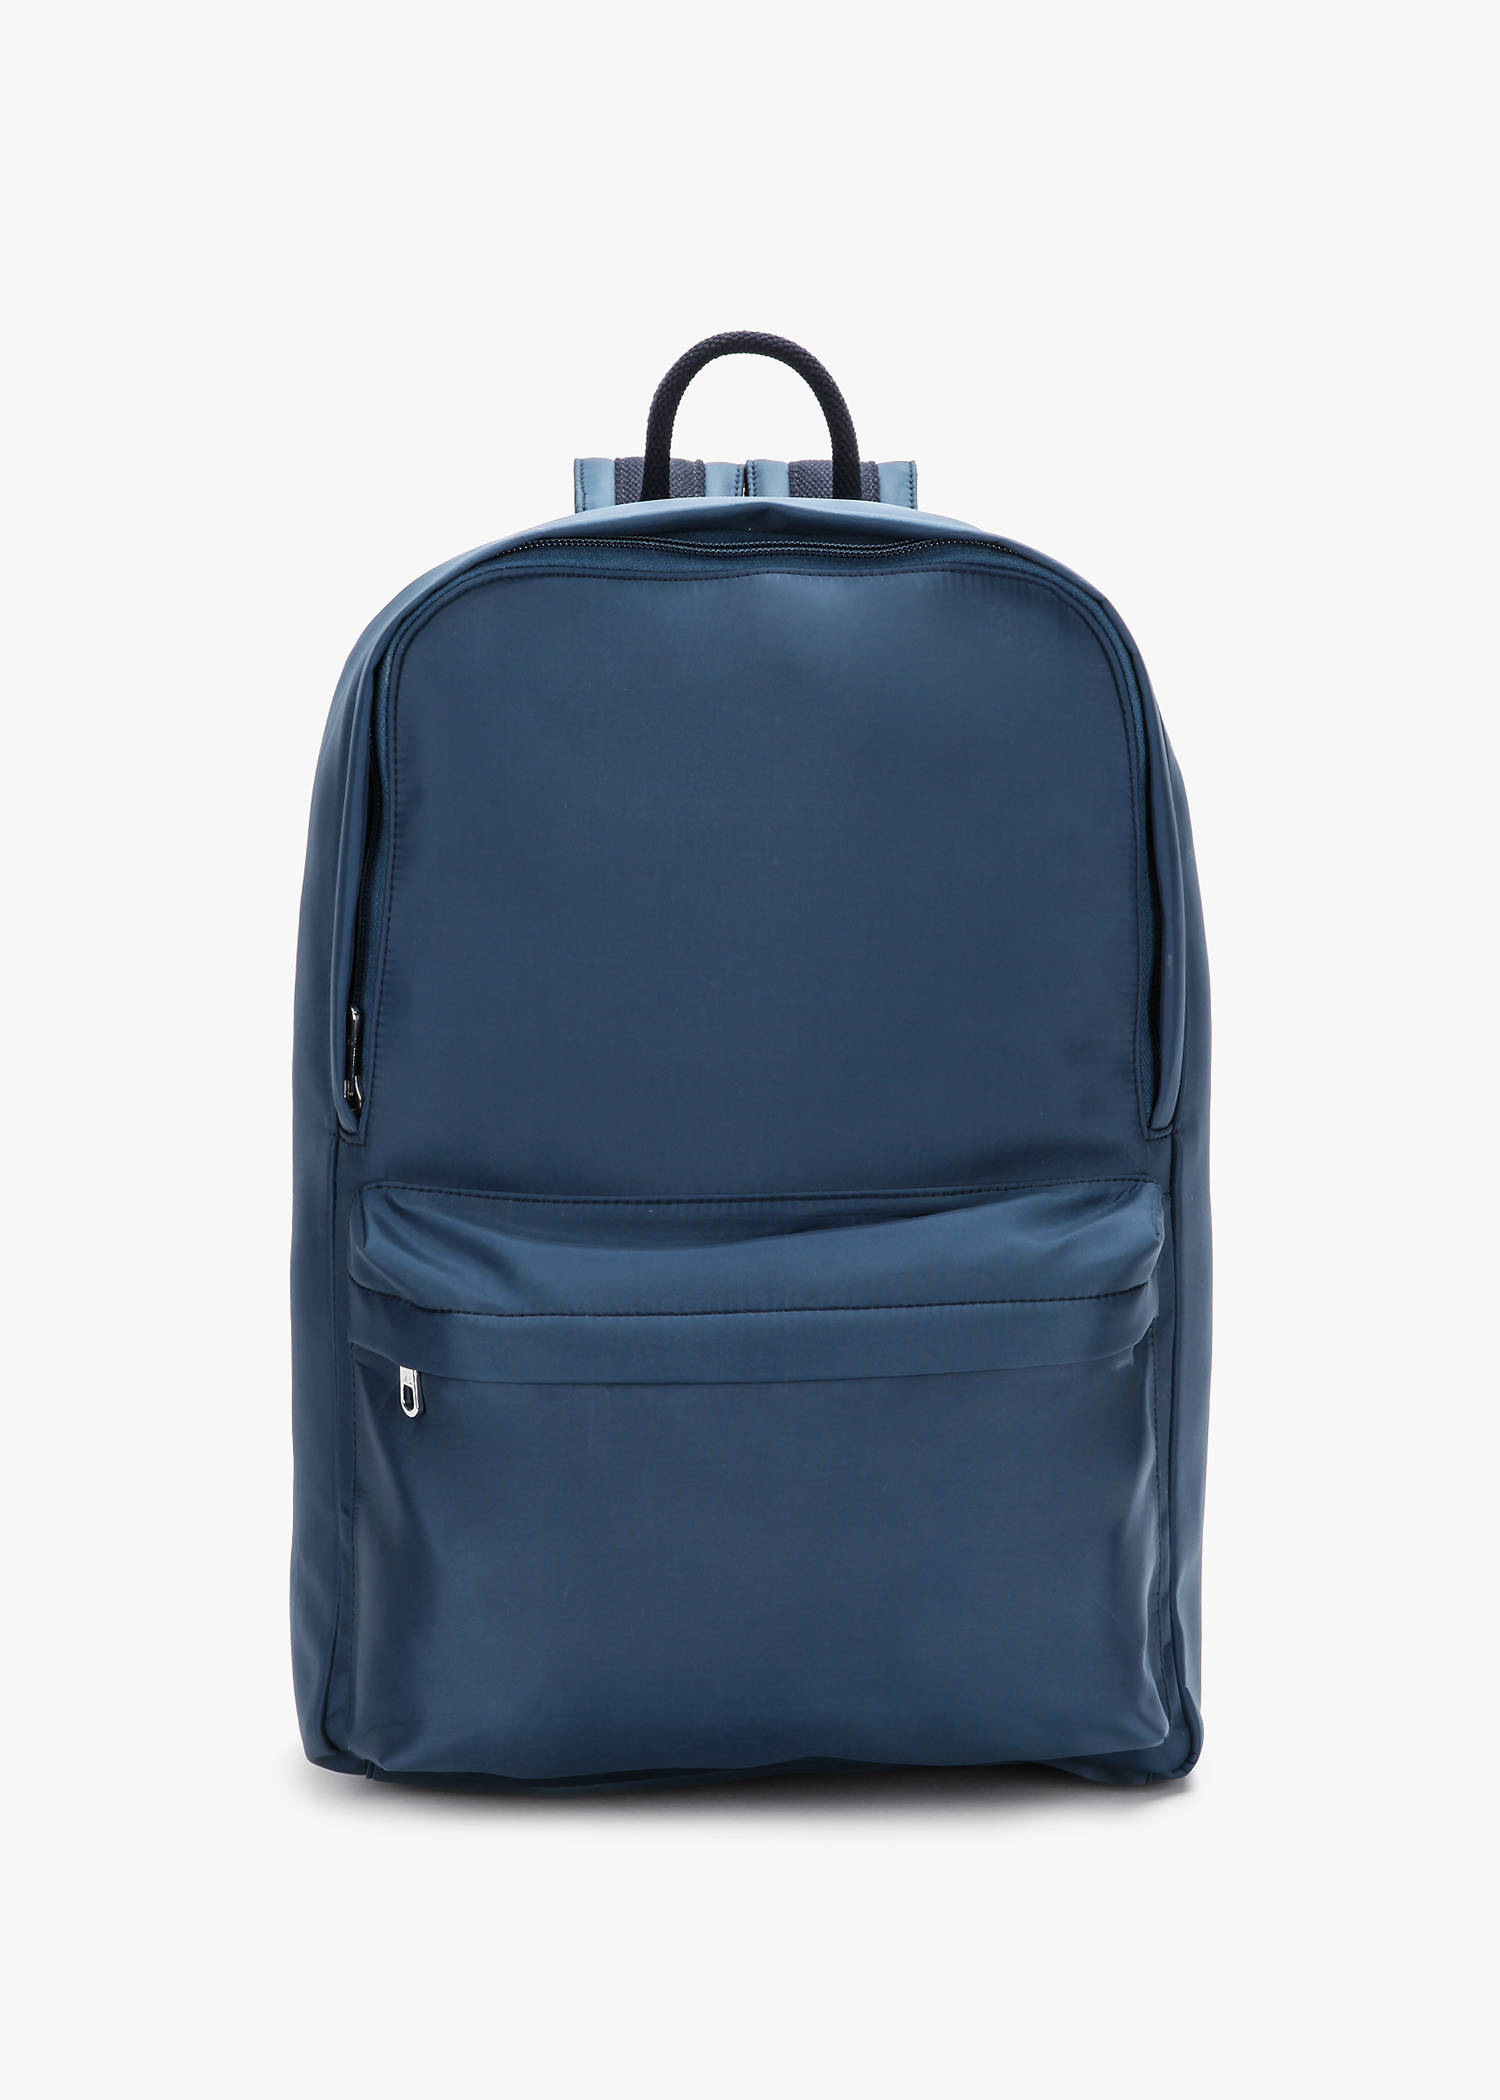 A.w.a.k.e. Arthur Backpack In Peacock Blue